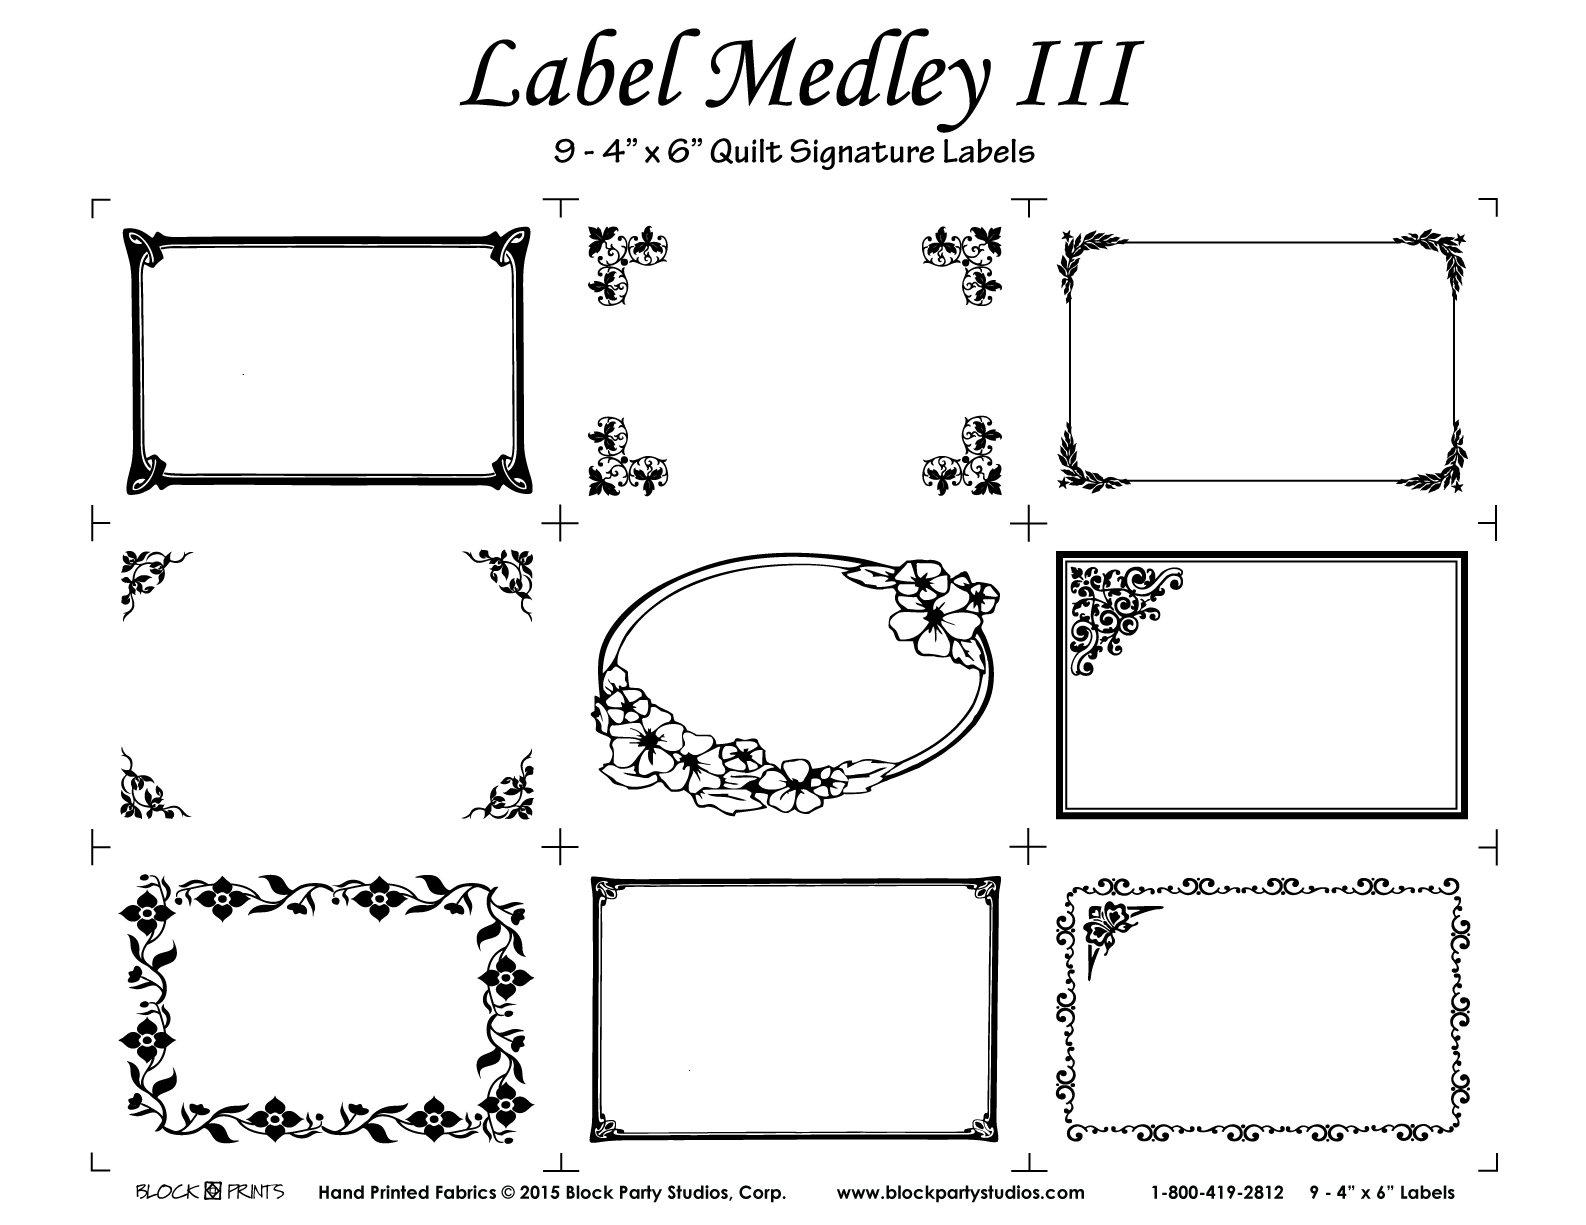 Label Medley III